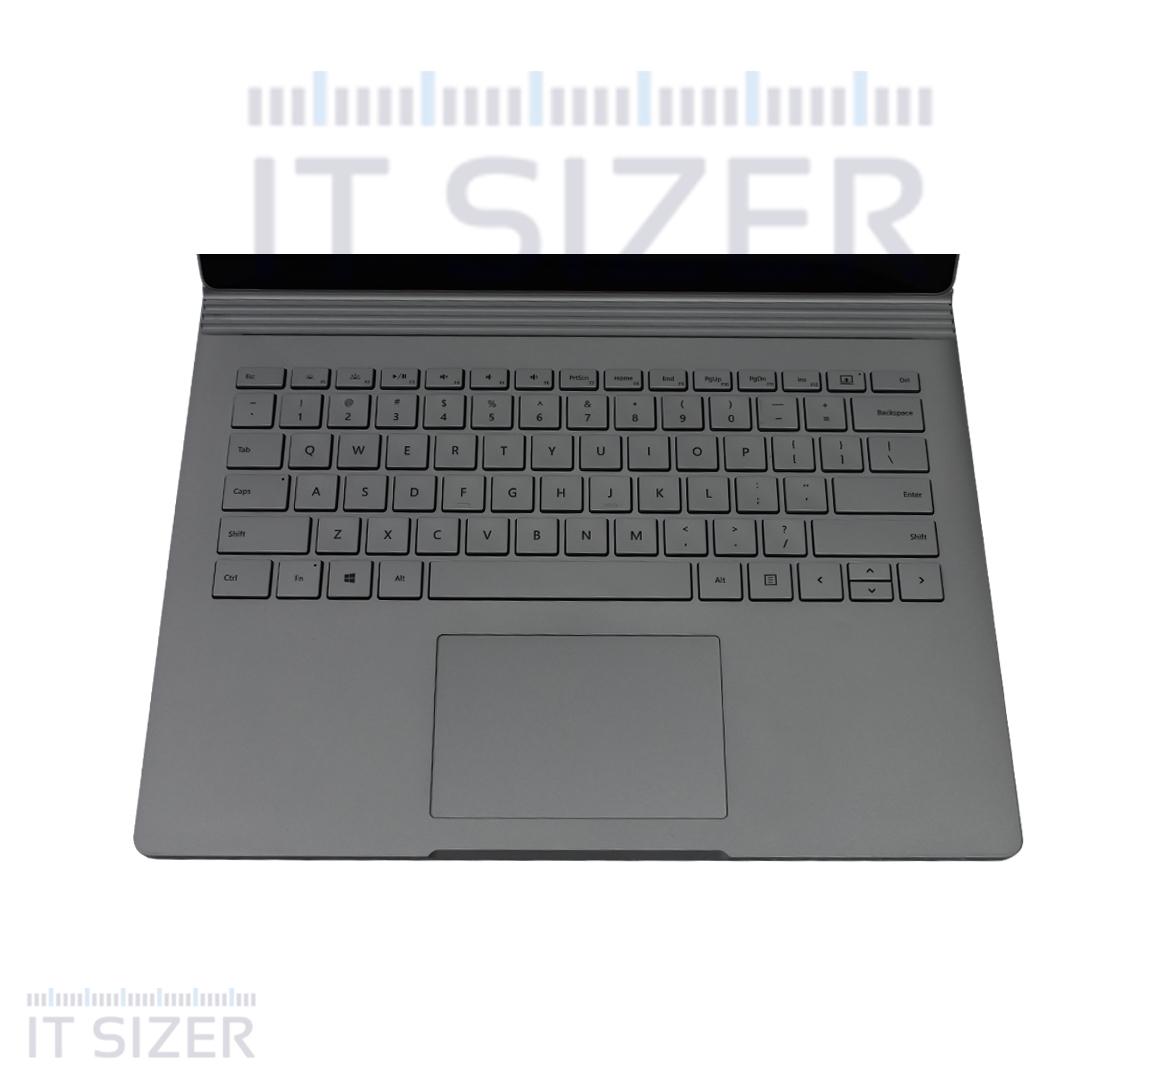 Microsoft Surface Book Business Laptop, Intel Core i7-6600U CPU, 16GB DDR4 BUILTIN RAM, 512GB SSD M2, 12 inch Touch Display, Windows 10 Pro (Renewed)